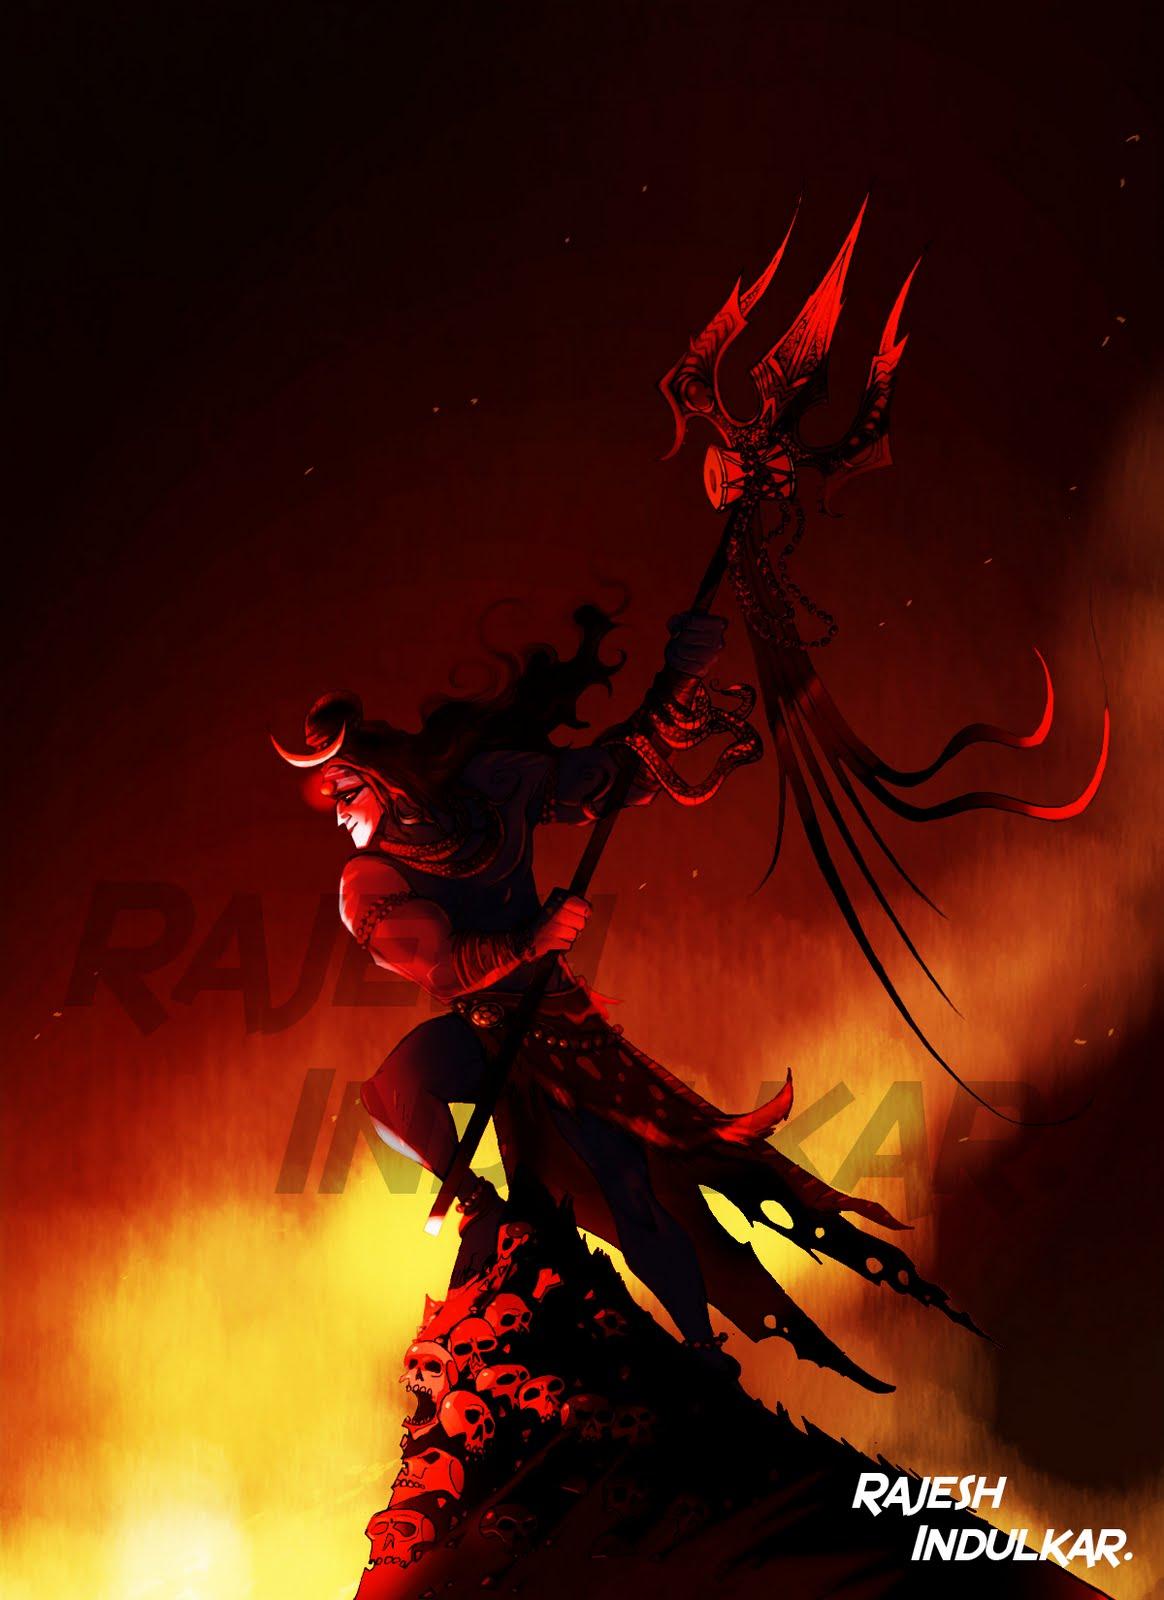 Lord Shiva Angry Lord shiva angry animated